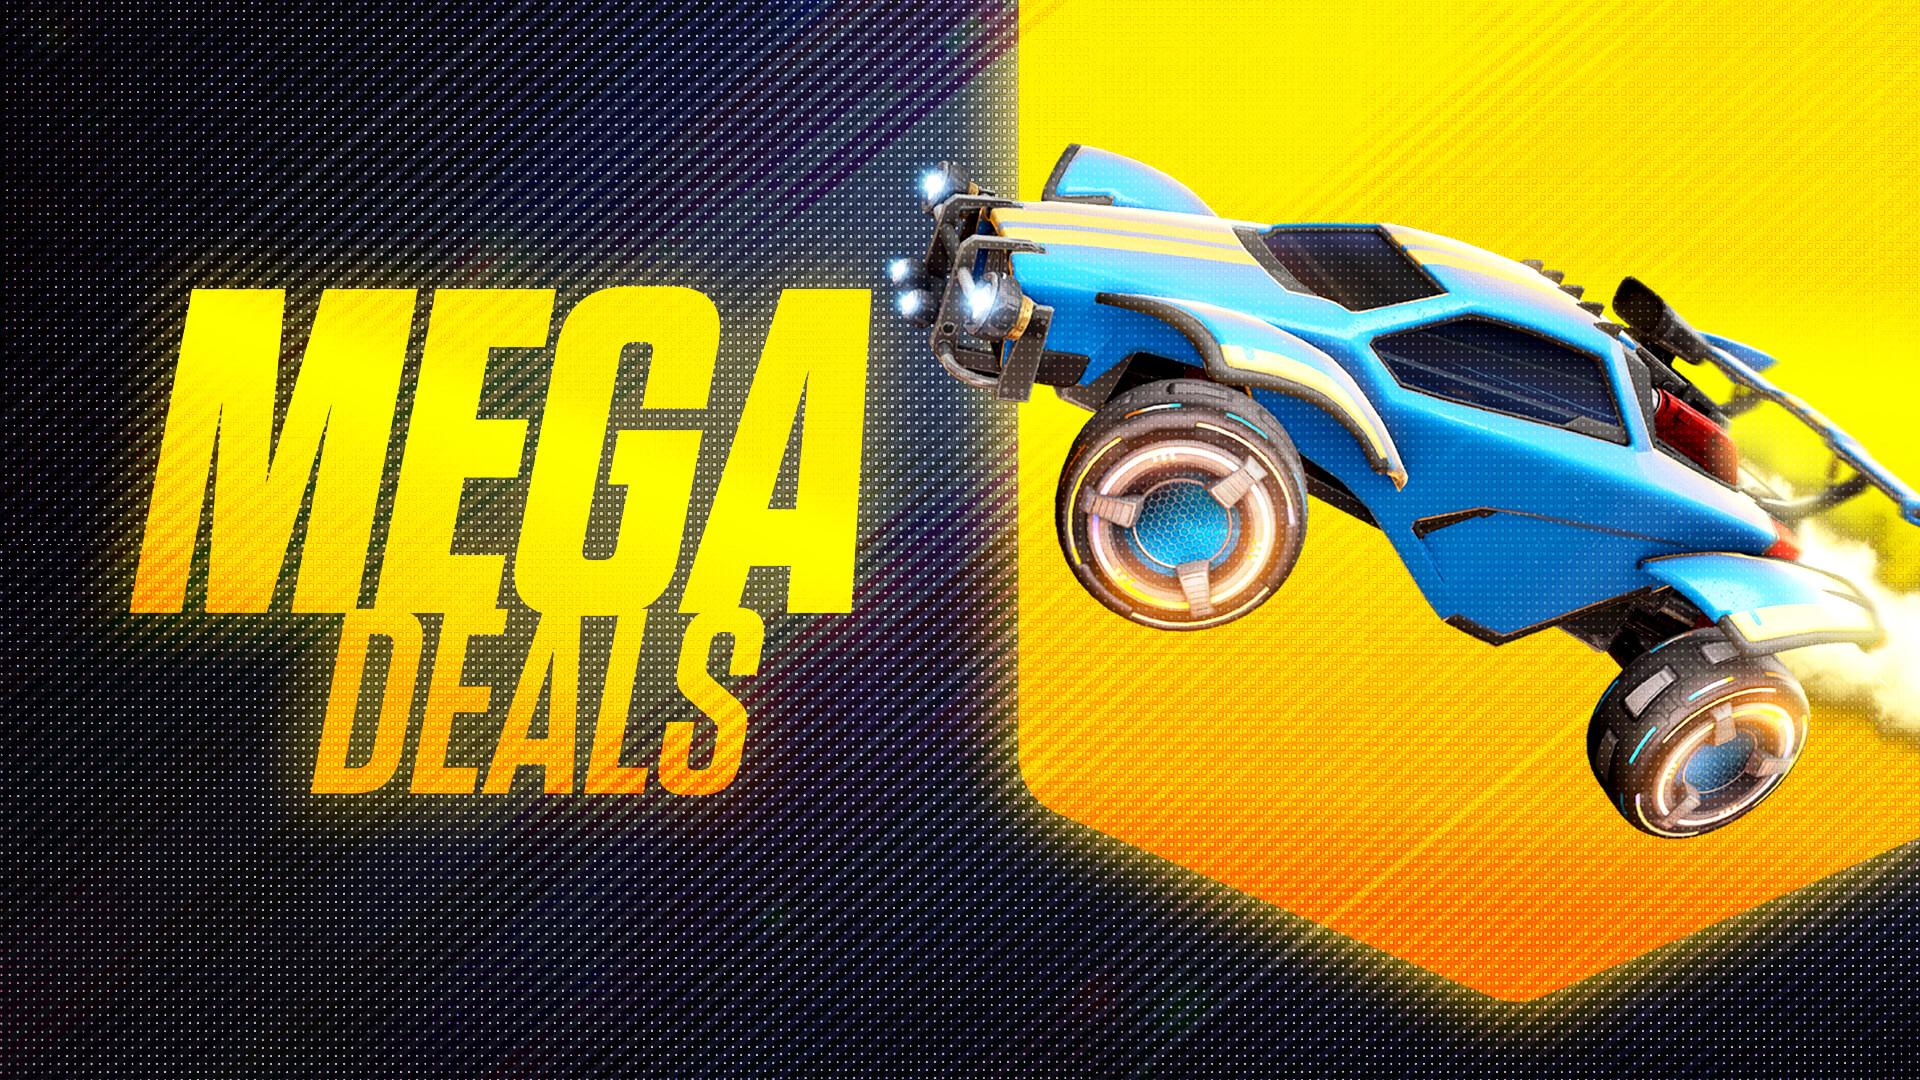 Rocket League Sarpbc 10 Wheels Mega Sale